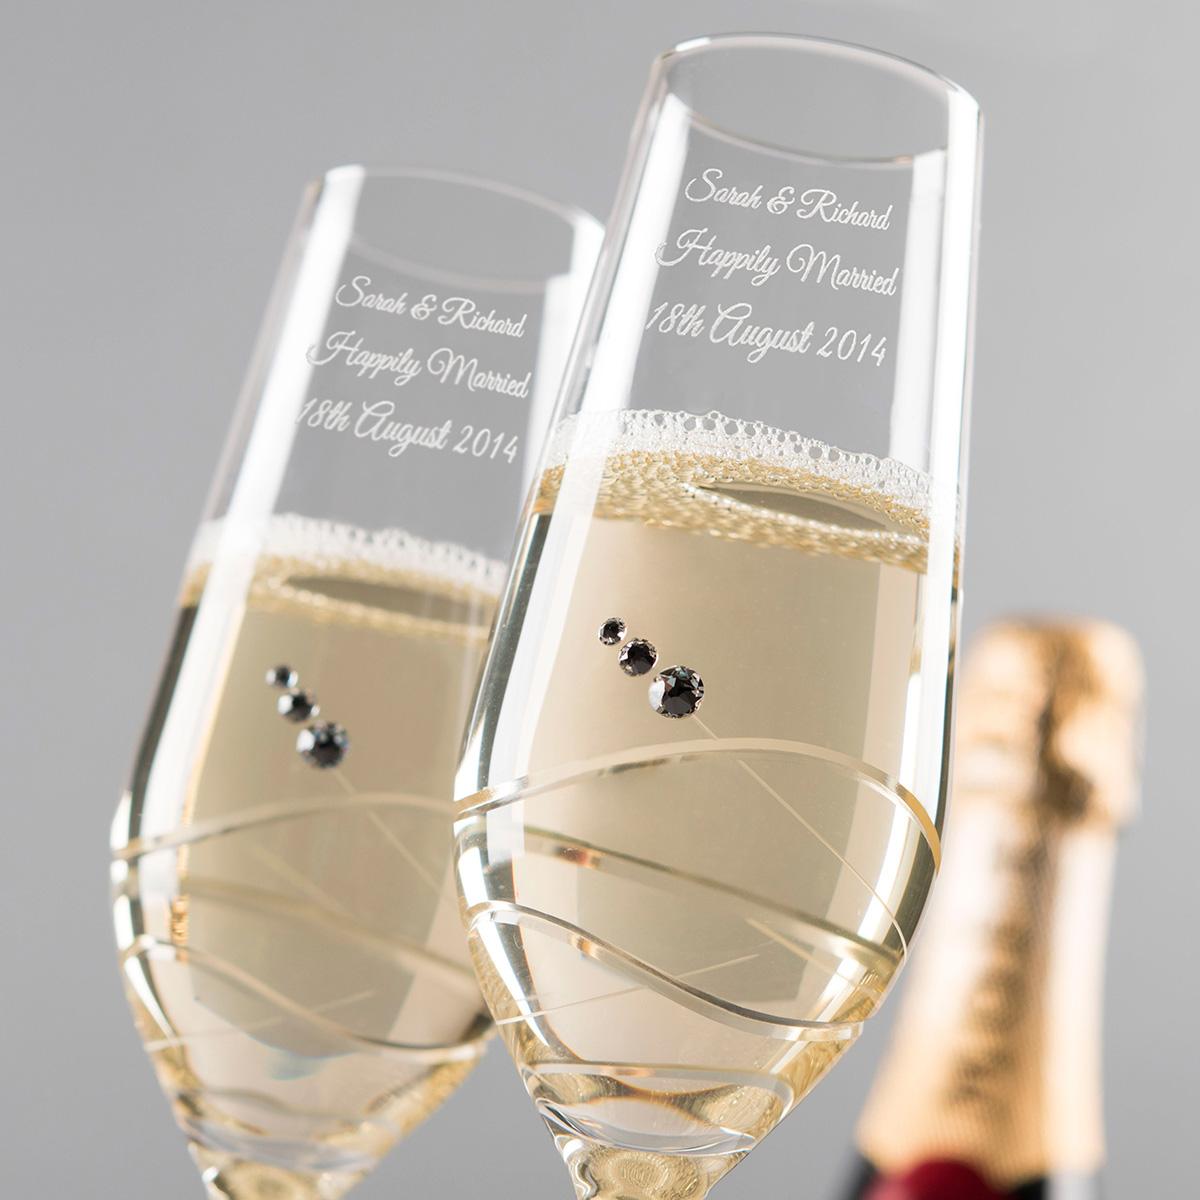 Wedding Gift Ideas Uk: Engraved Crystal Champagne Flutes